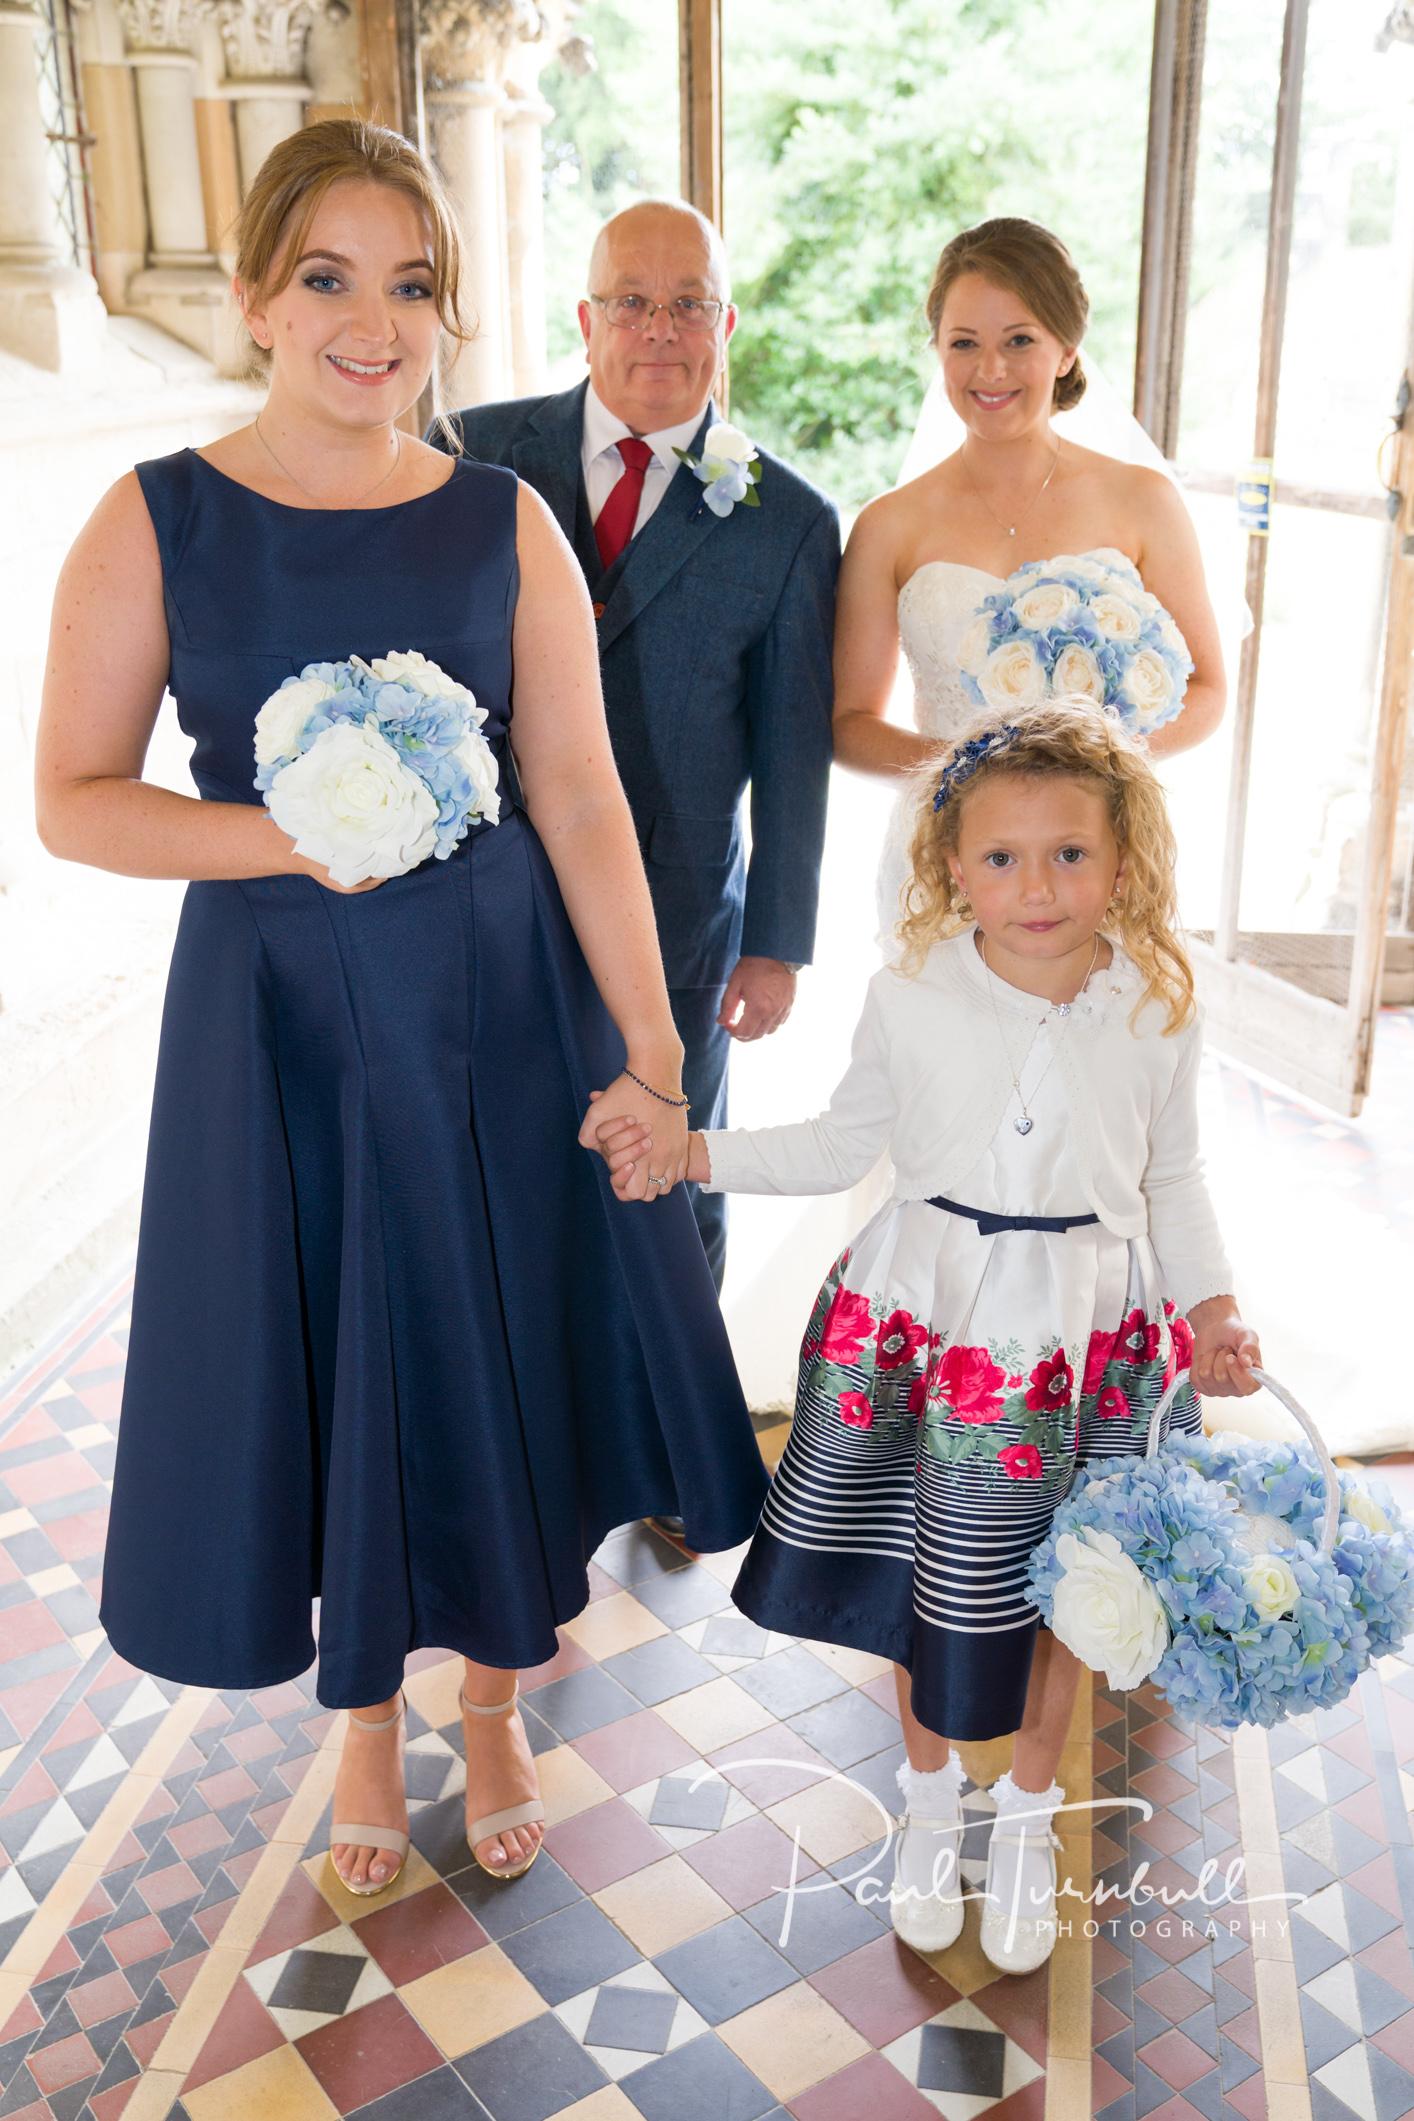 wedding-photographer-south-dalton-walkington-yorkshire-emma-james-032.jpg